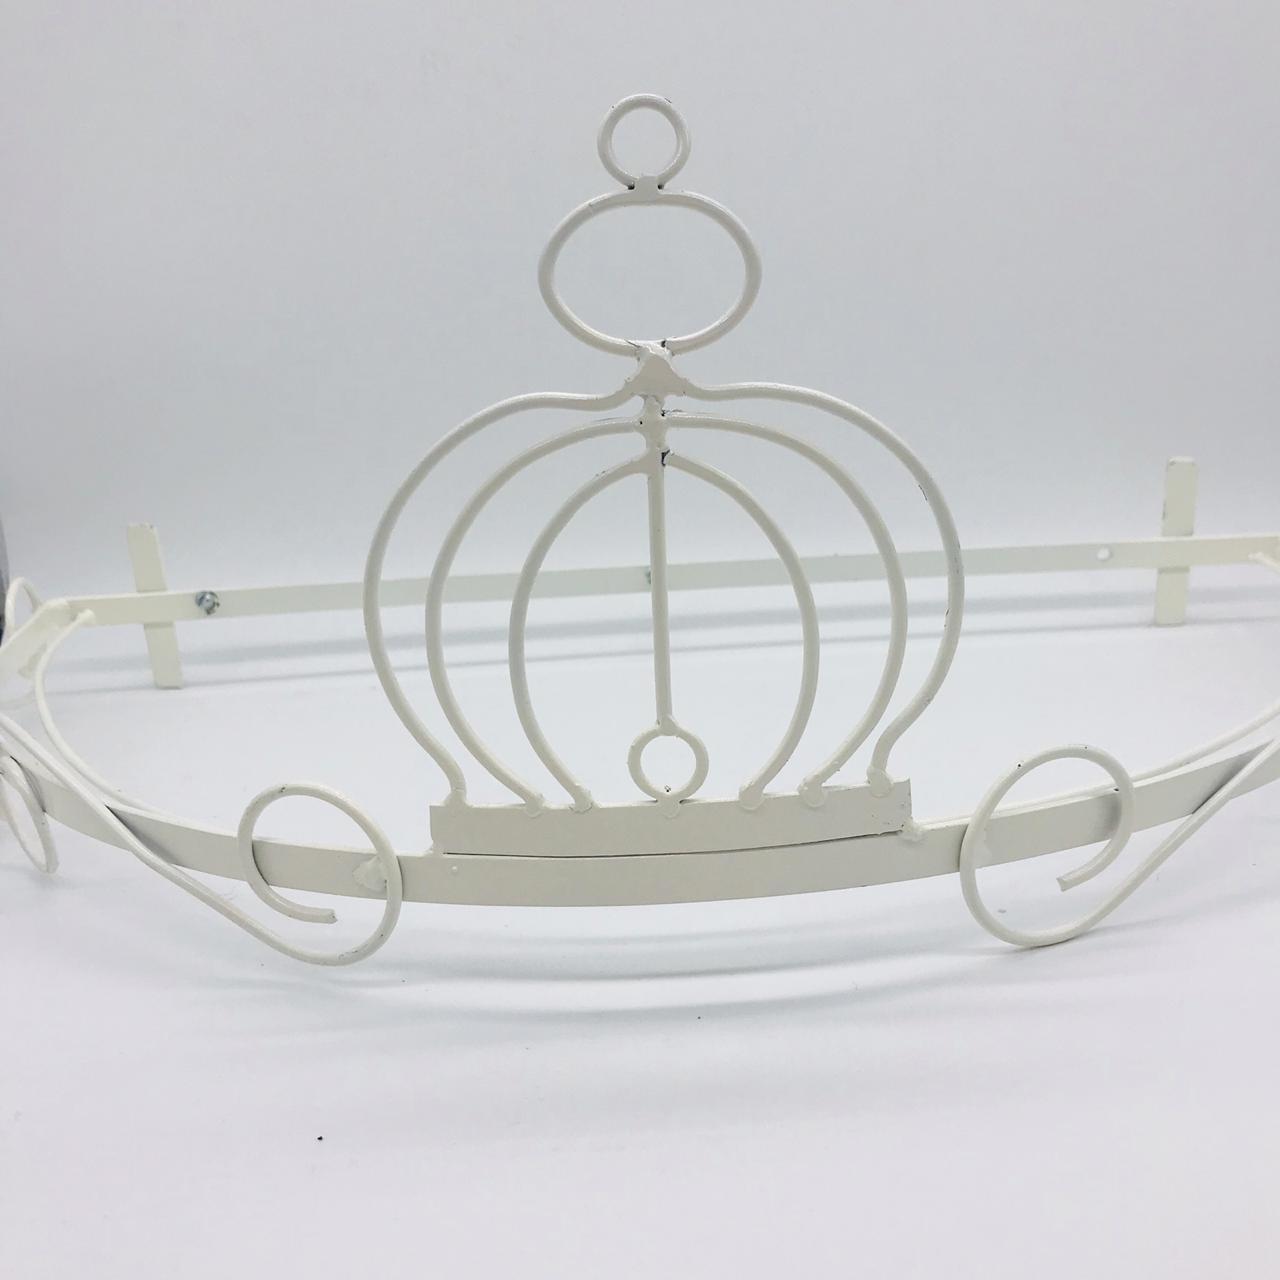 Dossel Branco Coroa - Magia e Fantasia Ref 119st 735u